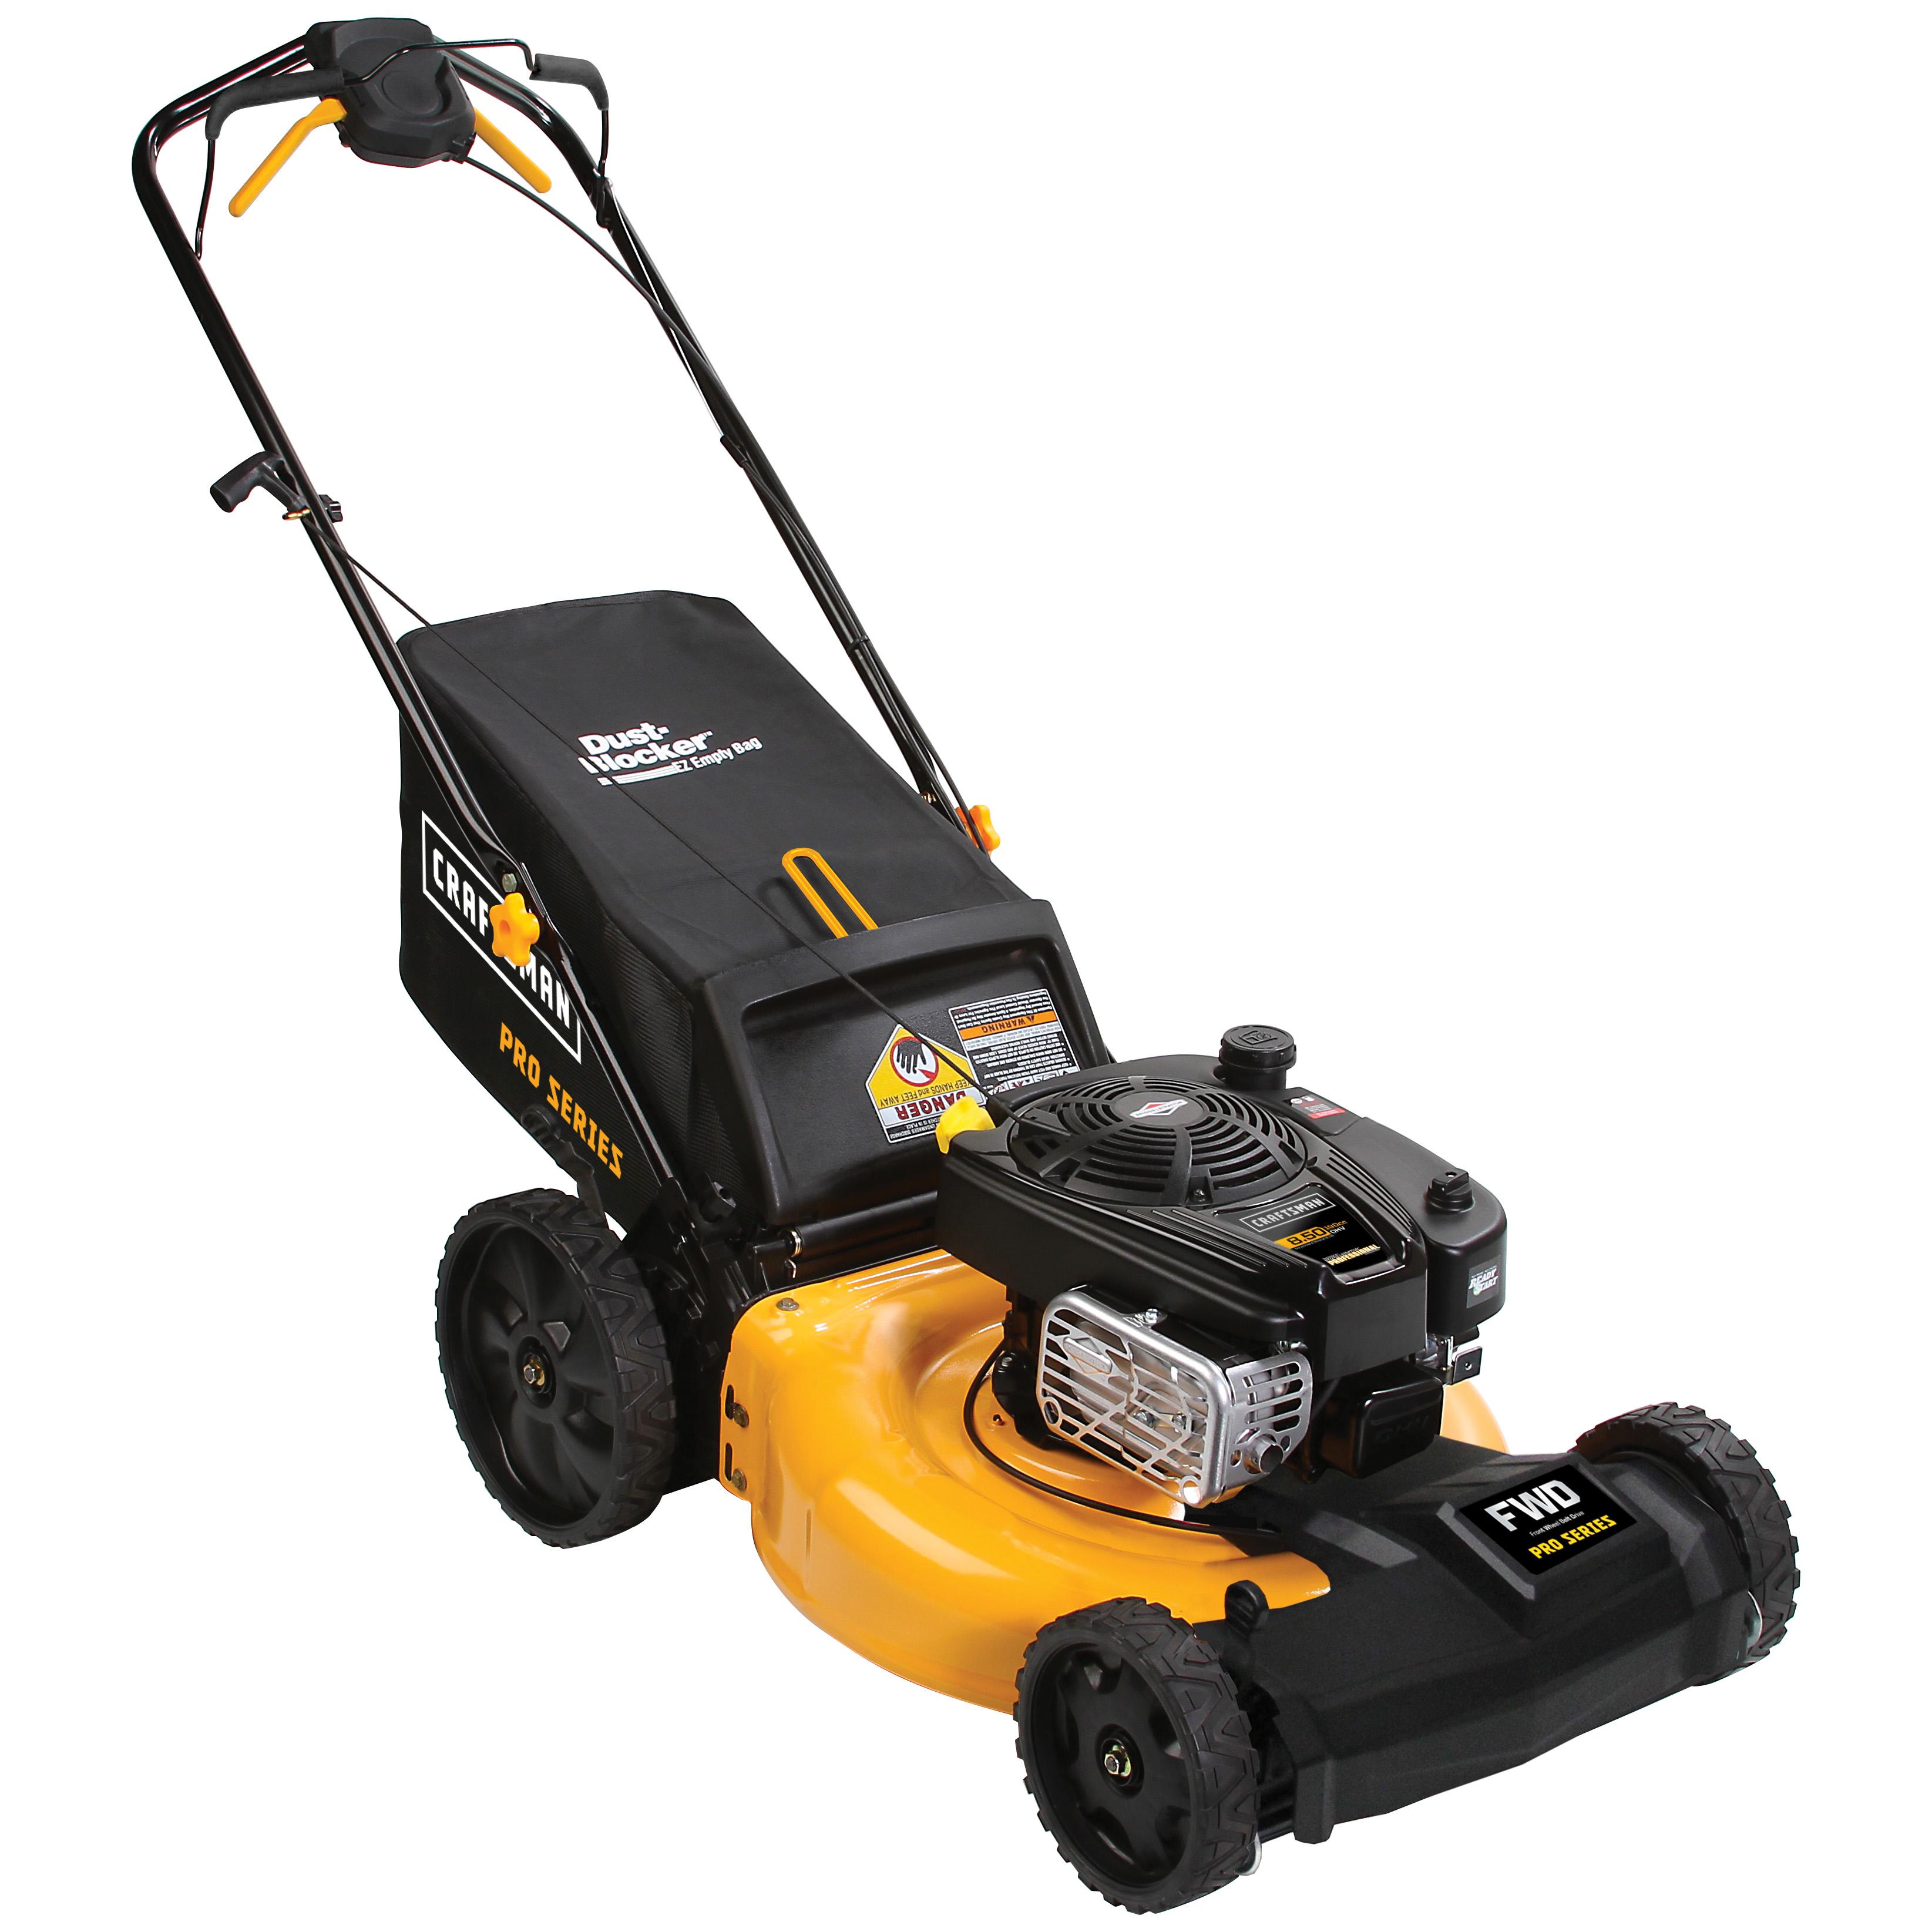 medium resolution of craftsman proseries 39760 21 190cc front wheel drive lawn mower